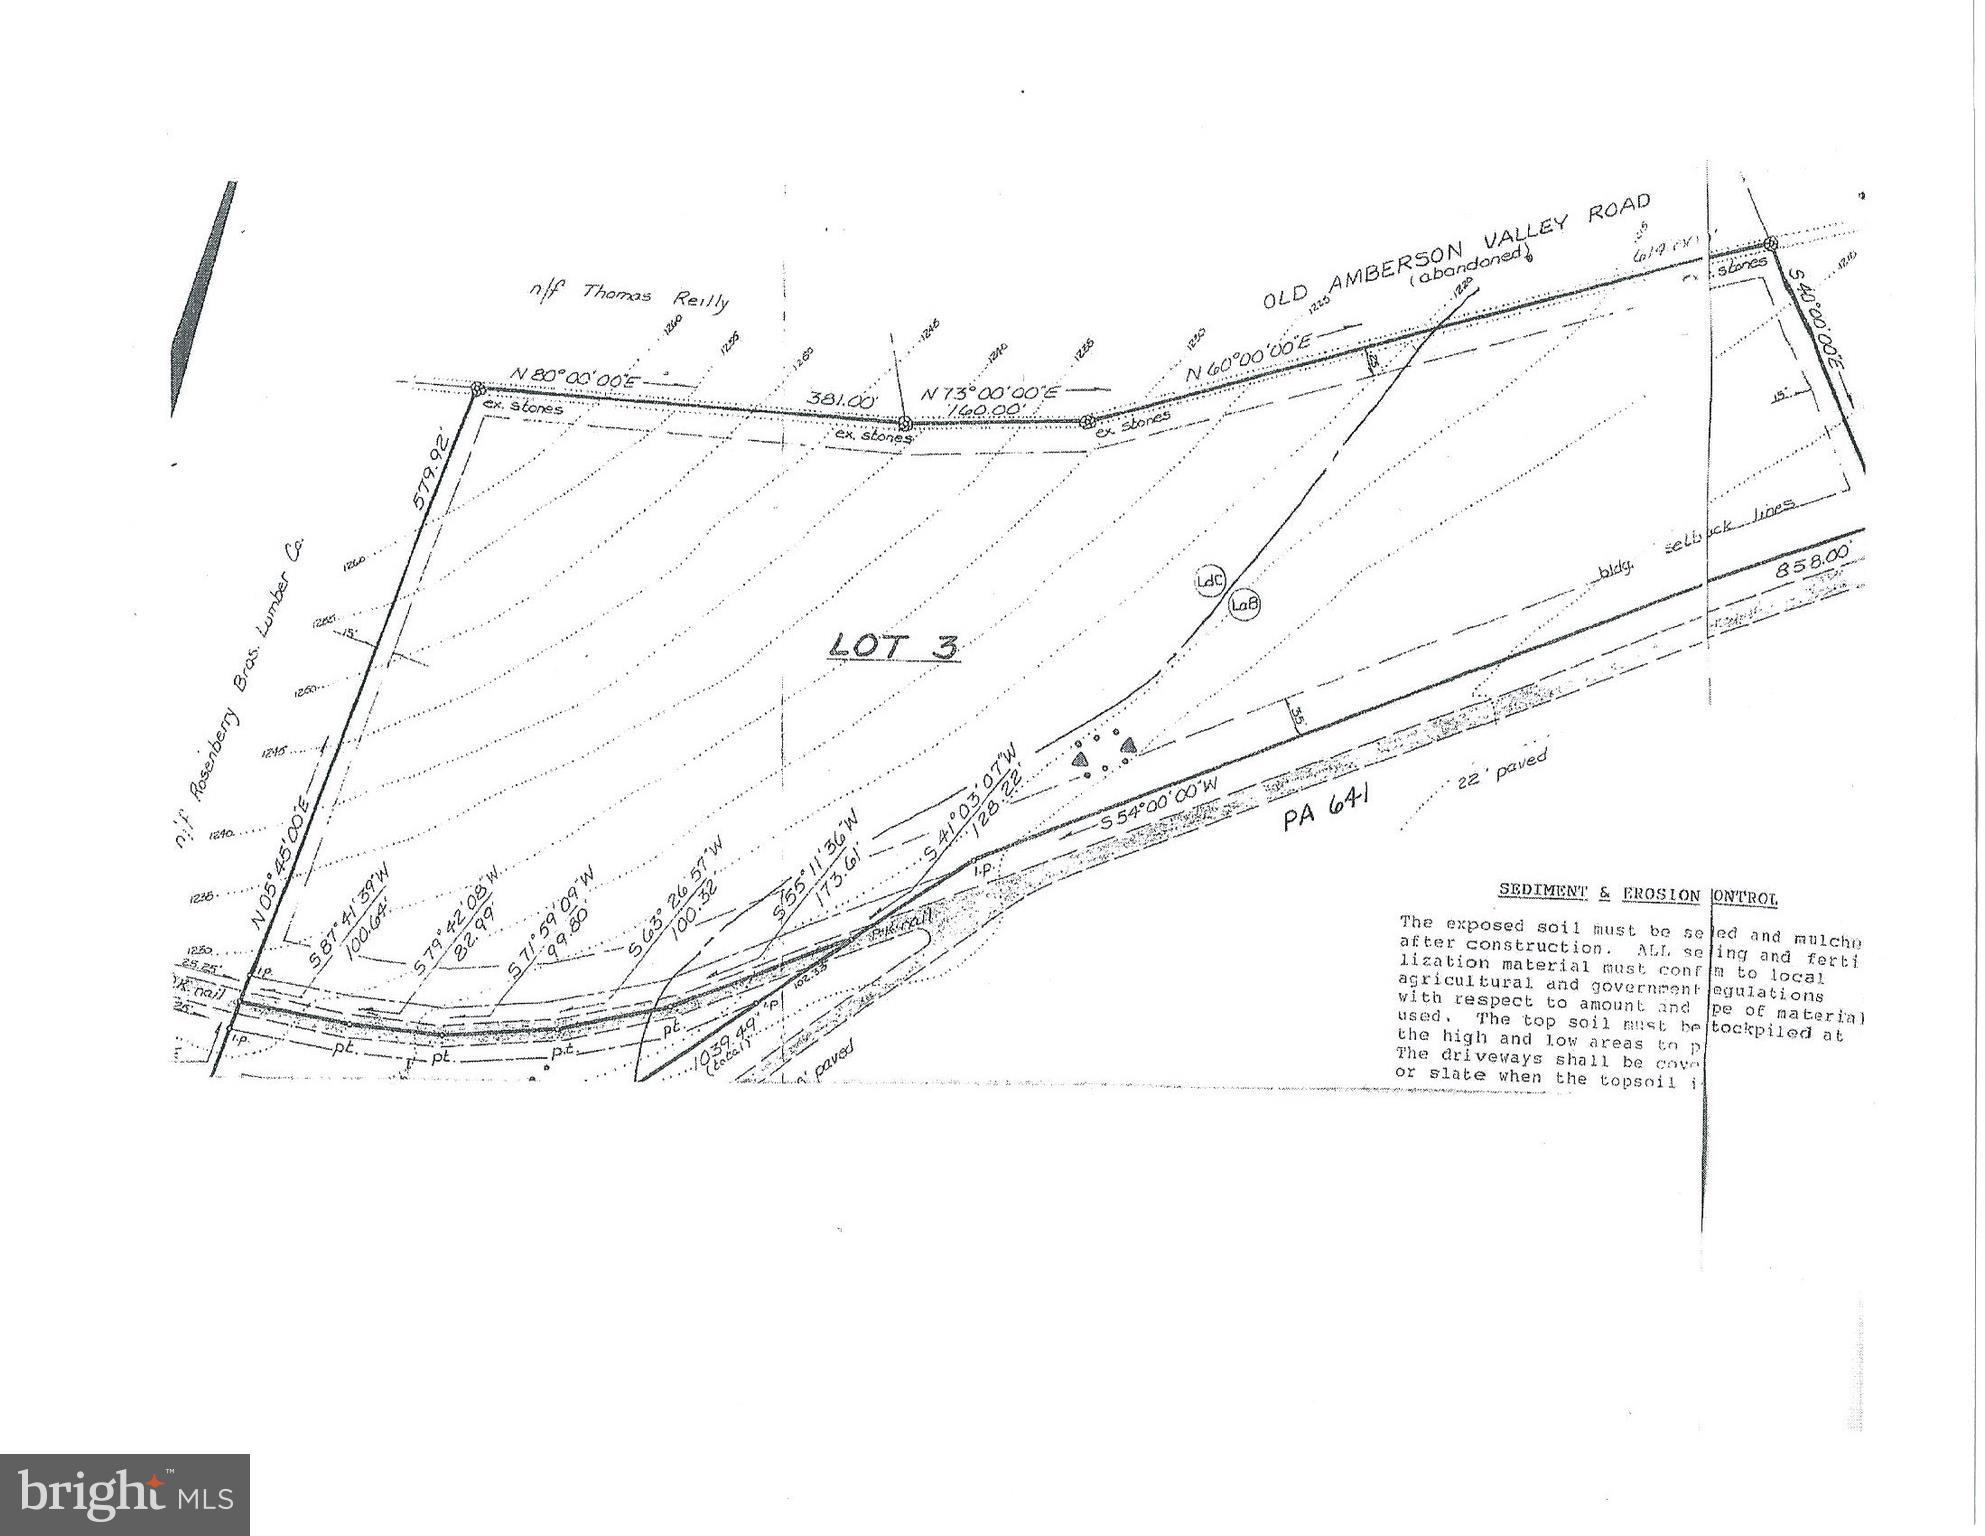 0 FORGE HILL ROAD, ROXBURY, PA 17251